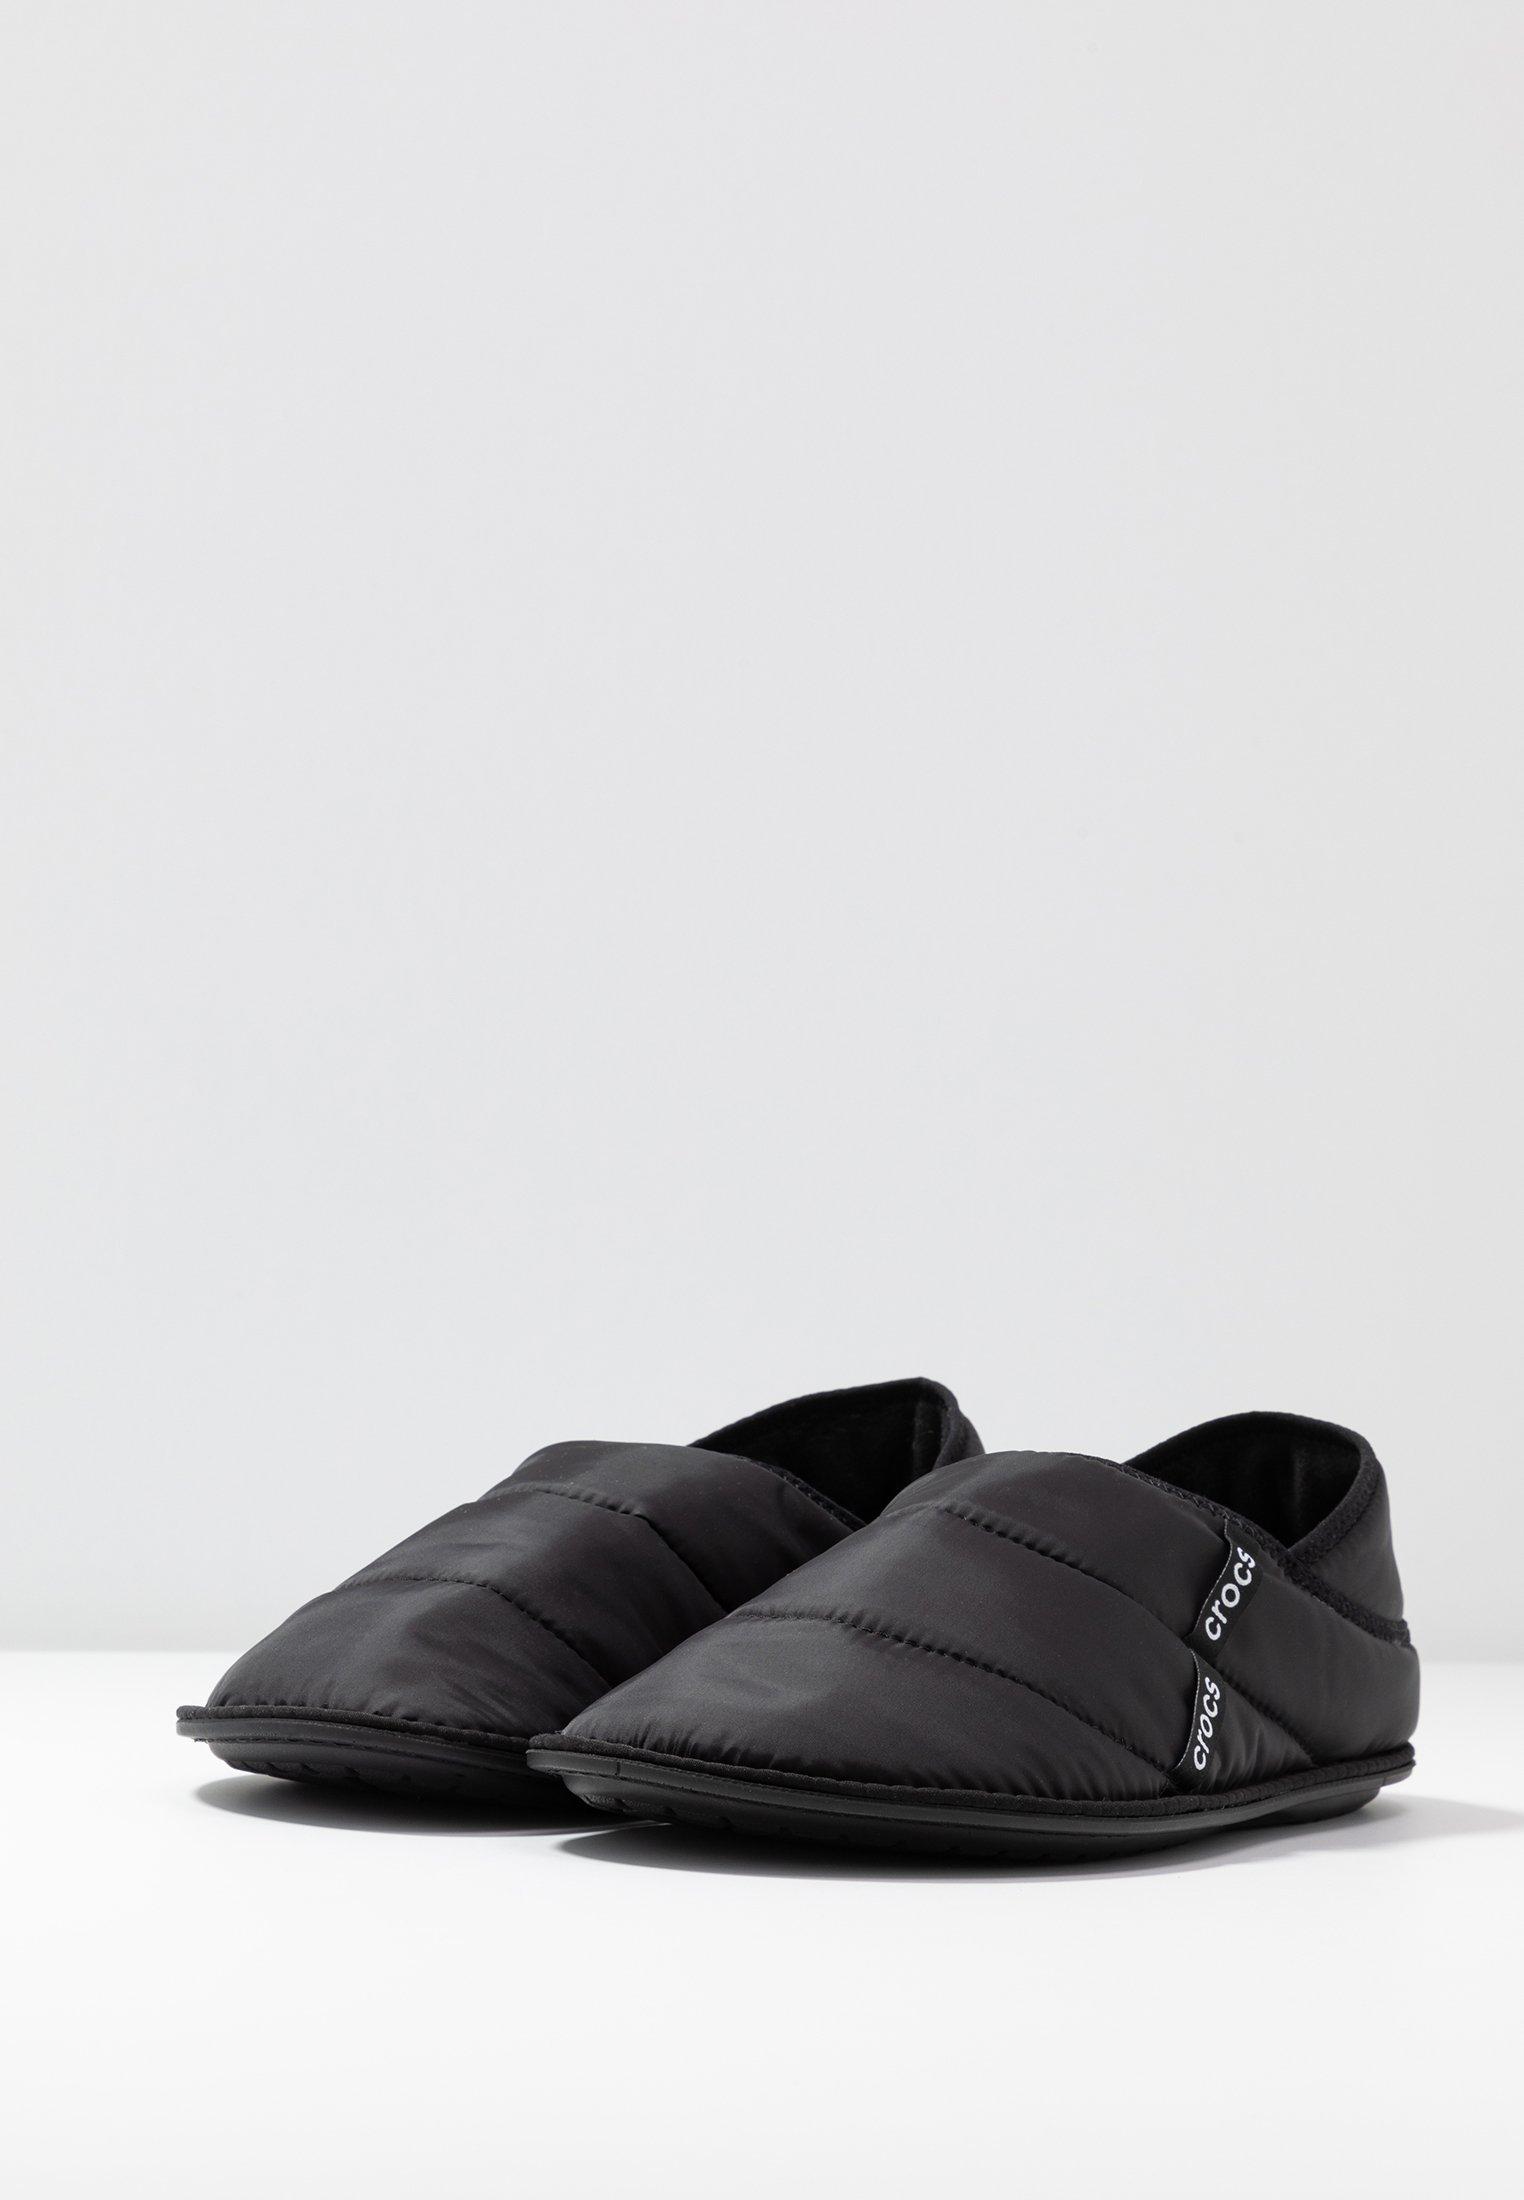 Crocs NEO PUFF SLIPPER - Hausschuh black